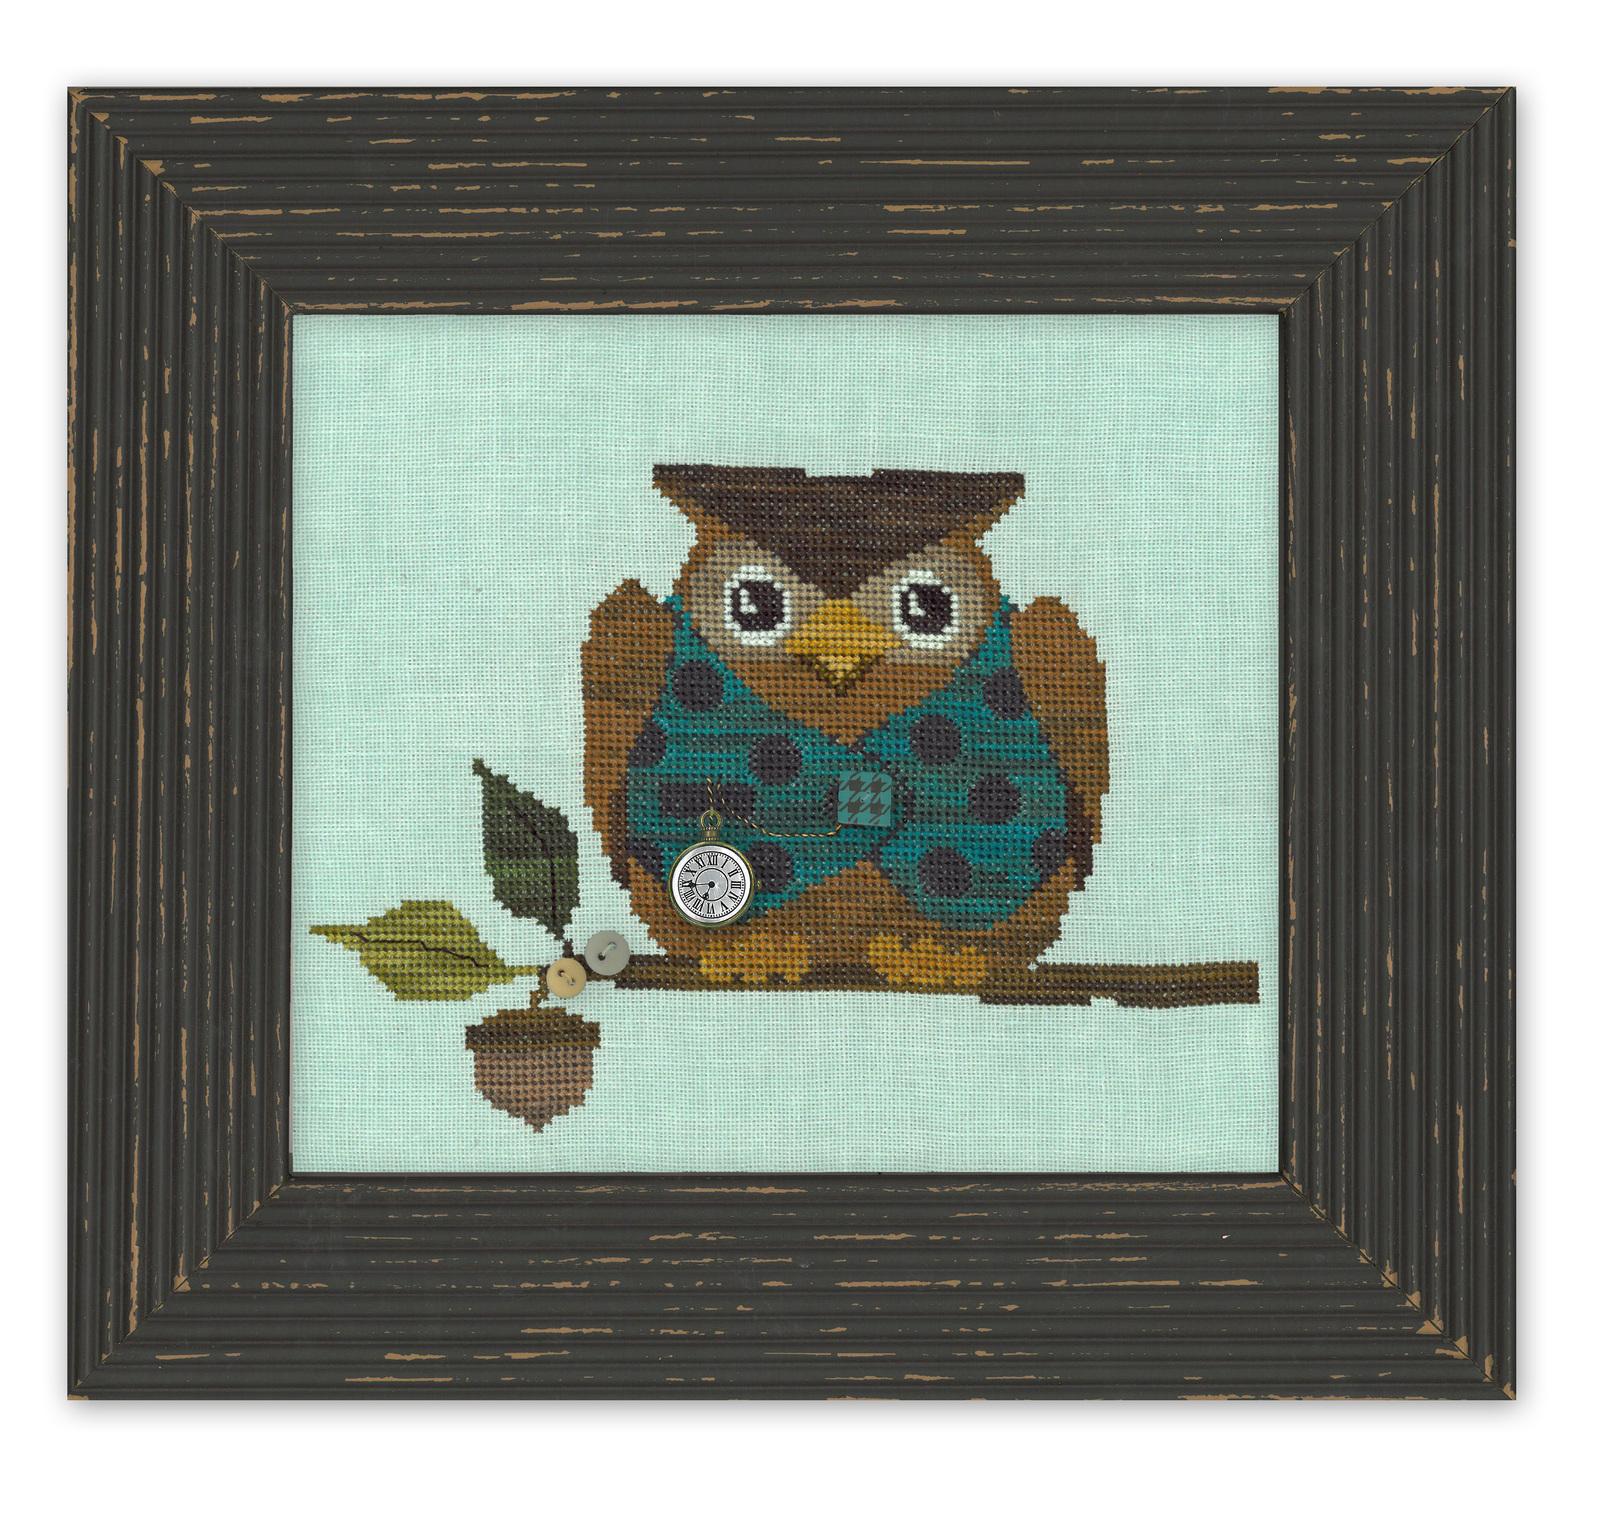 Final owl in frame